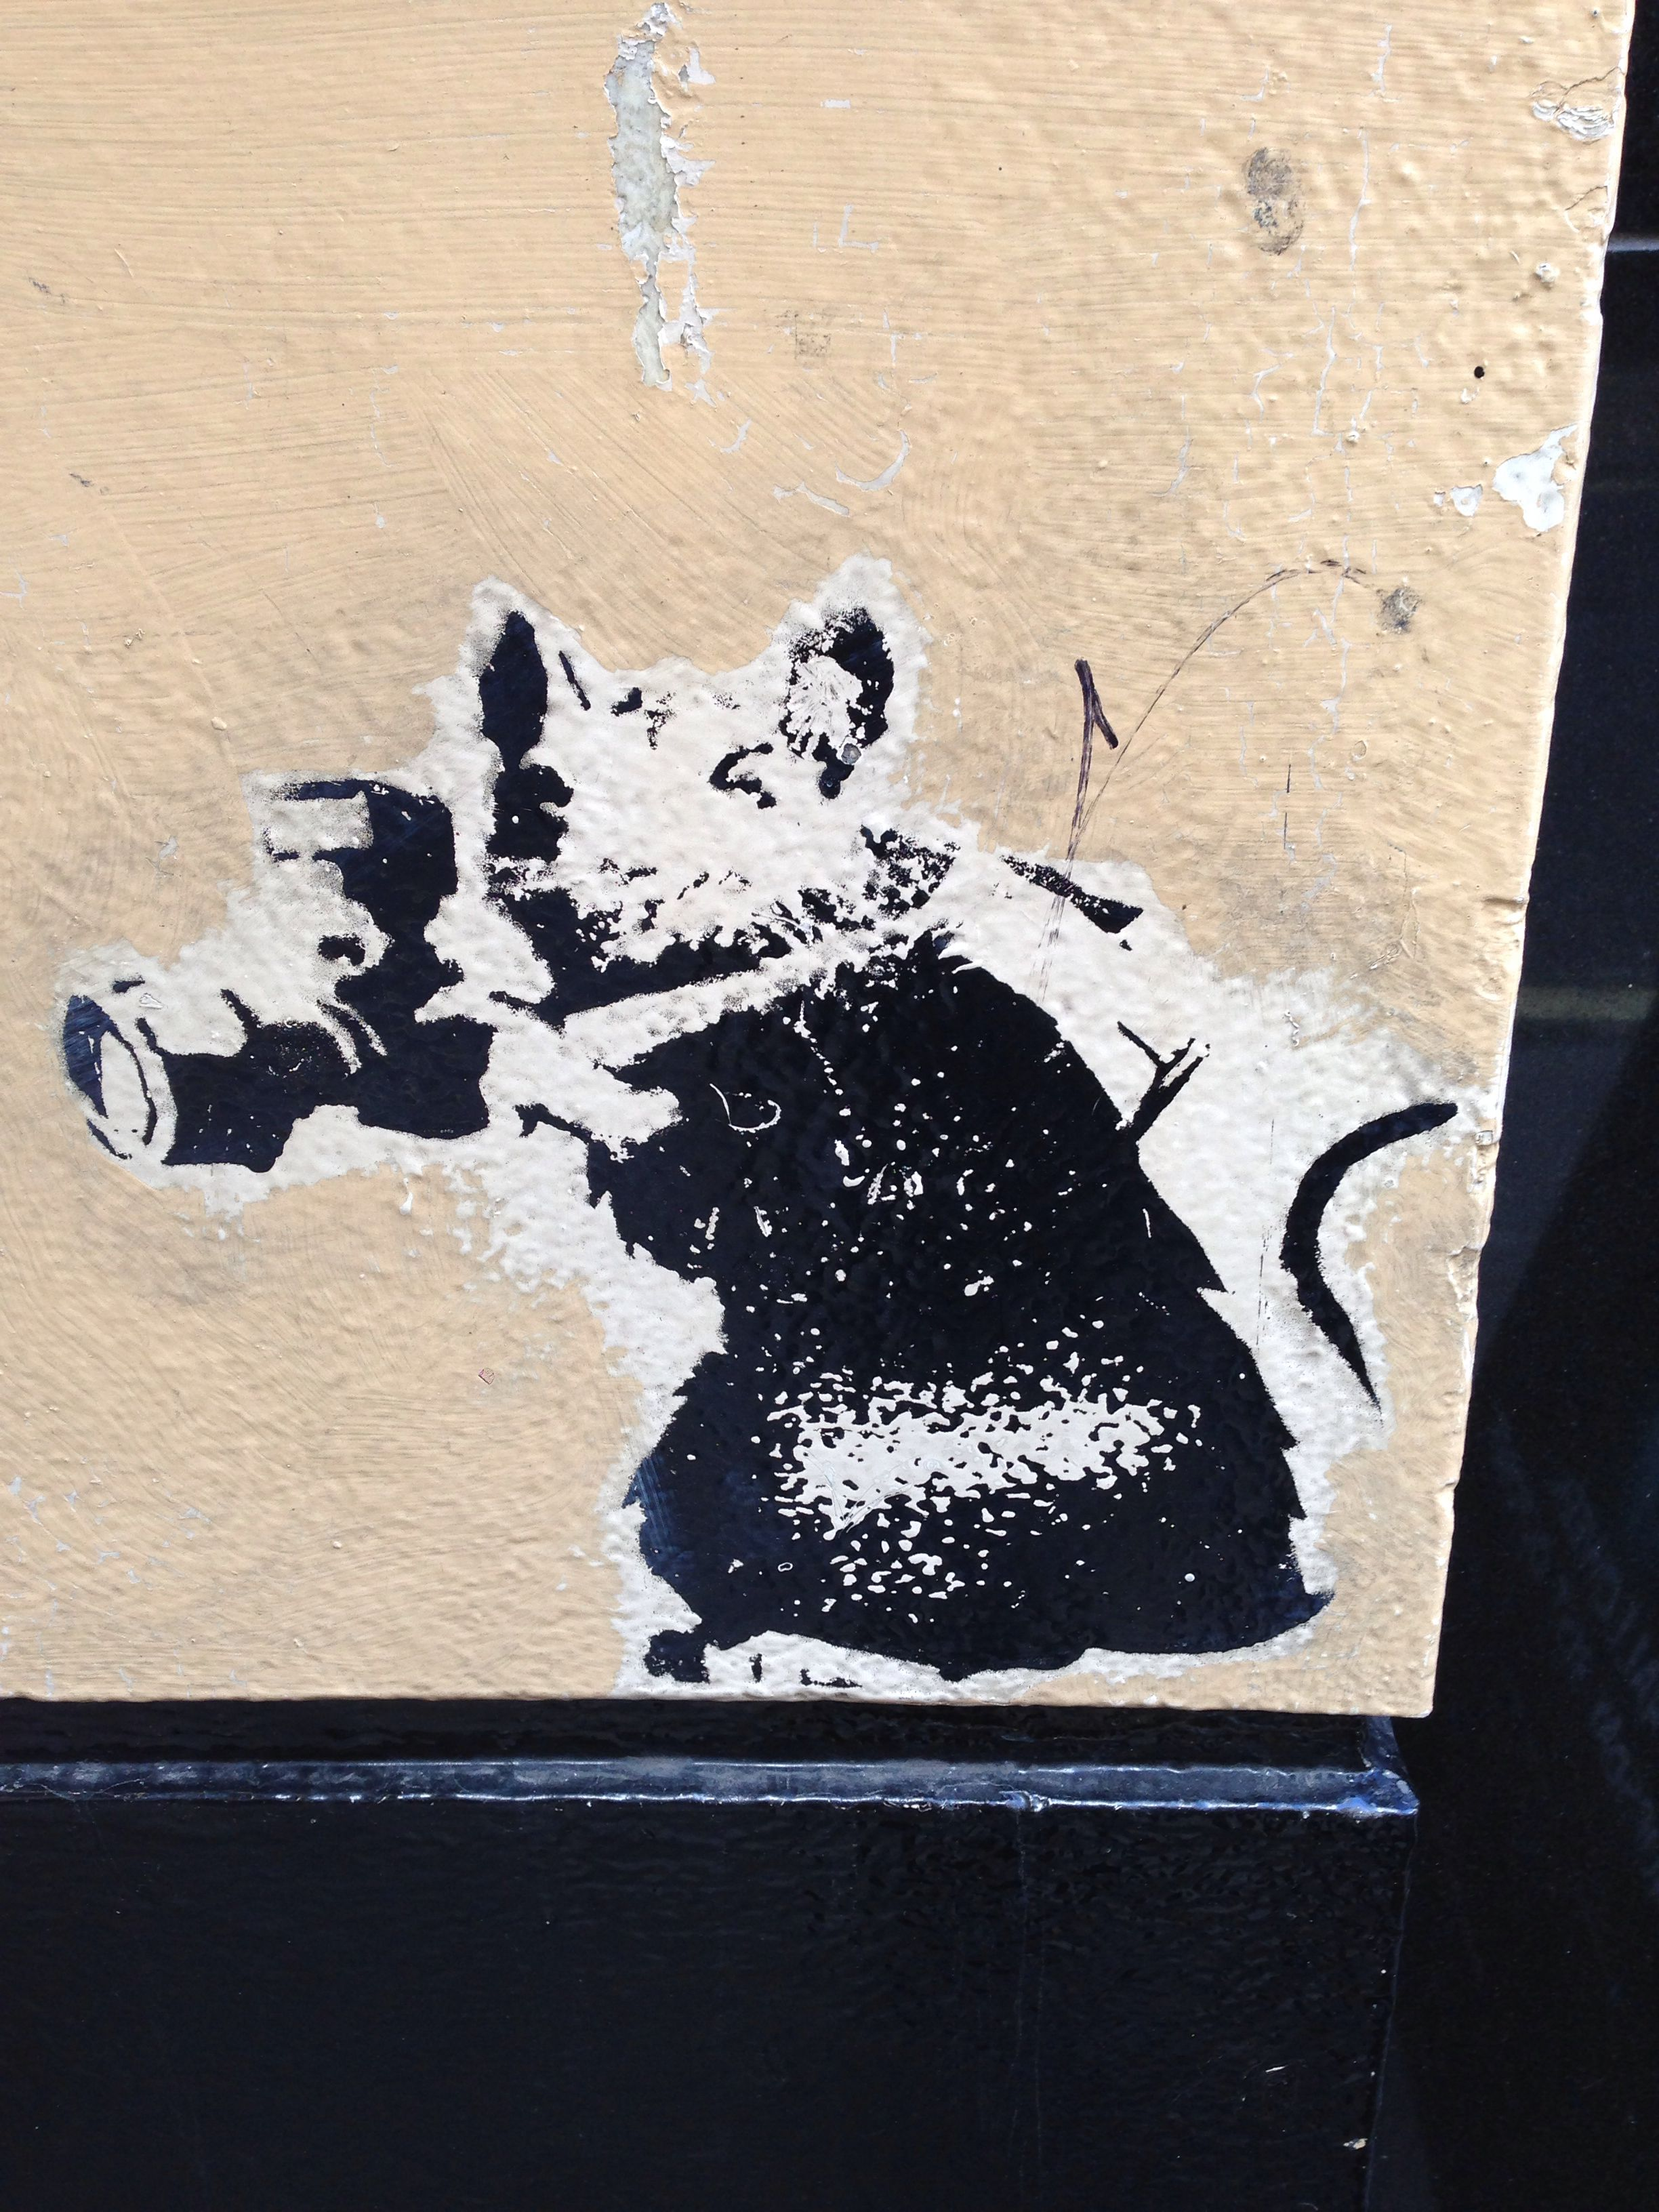 Banksy graffiti / stencil / piece at downtown London. Spotted below a restaurant window.